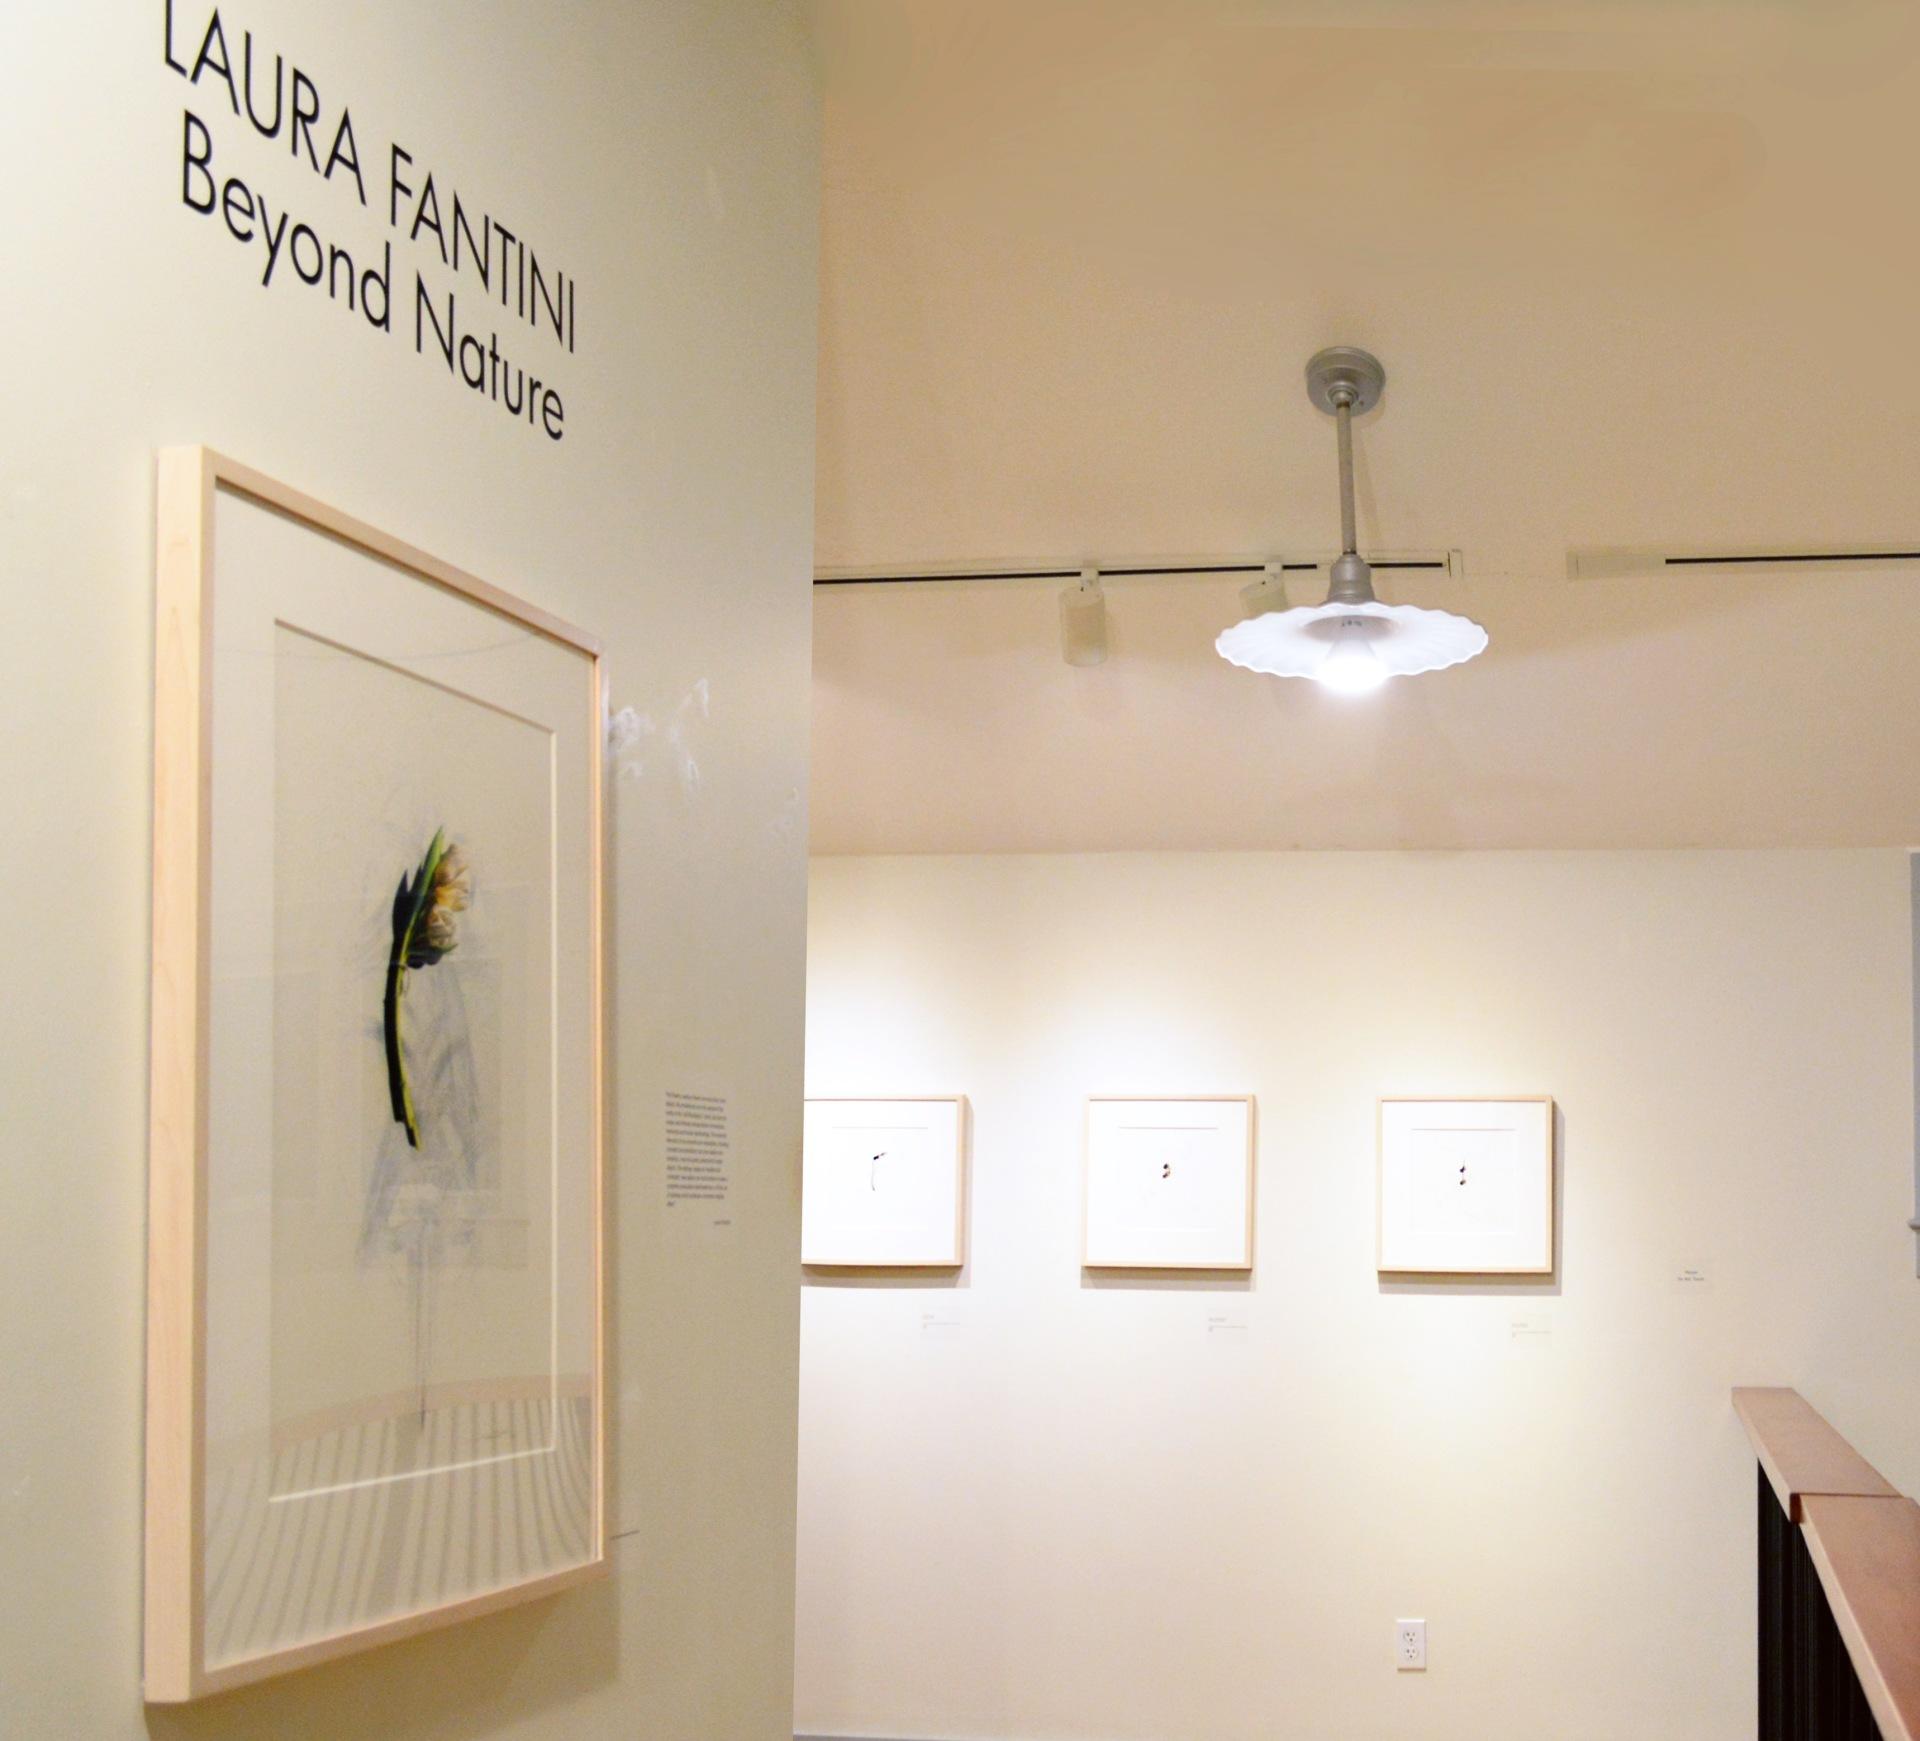 Laura Fantini: Beyond Nature